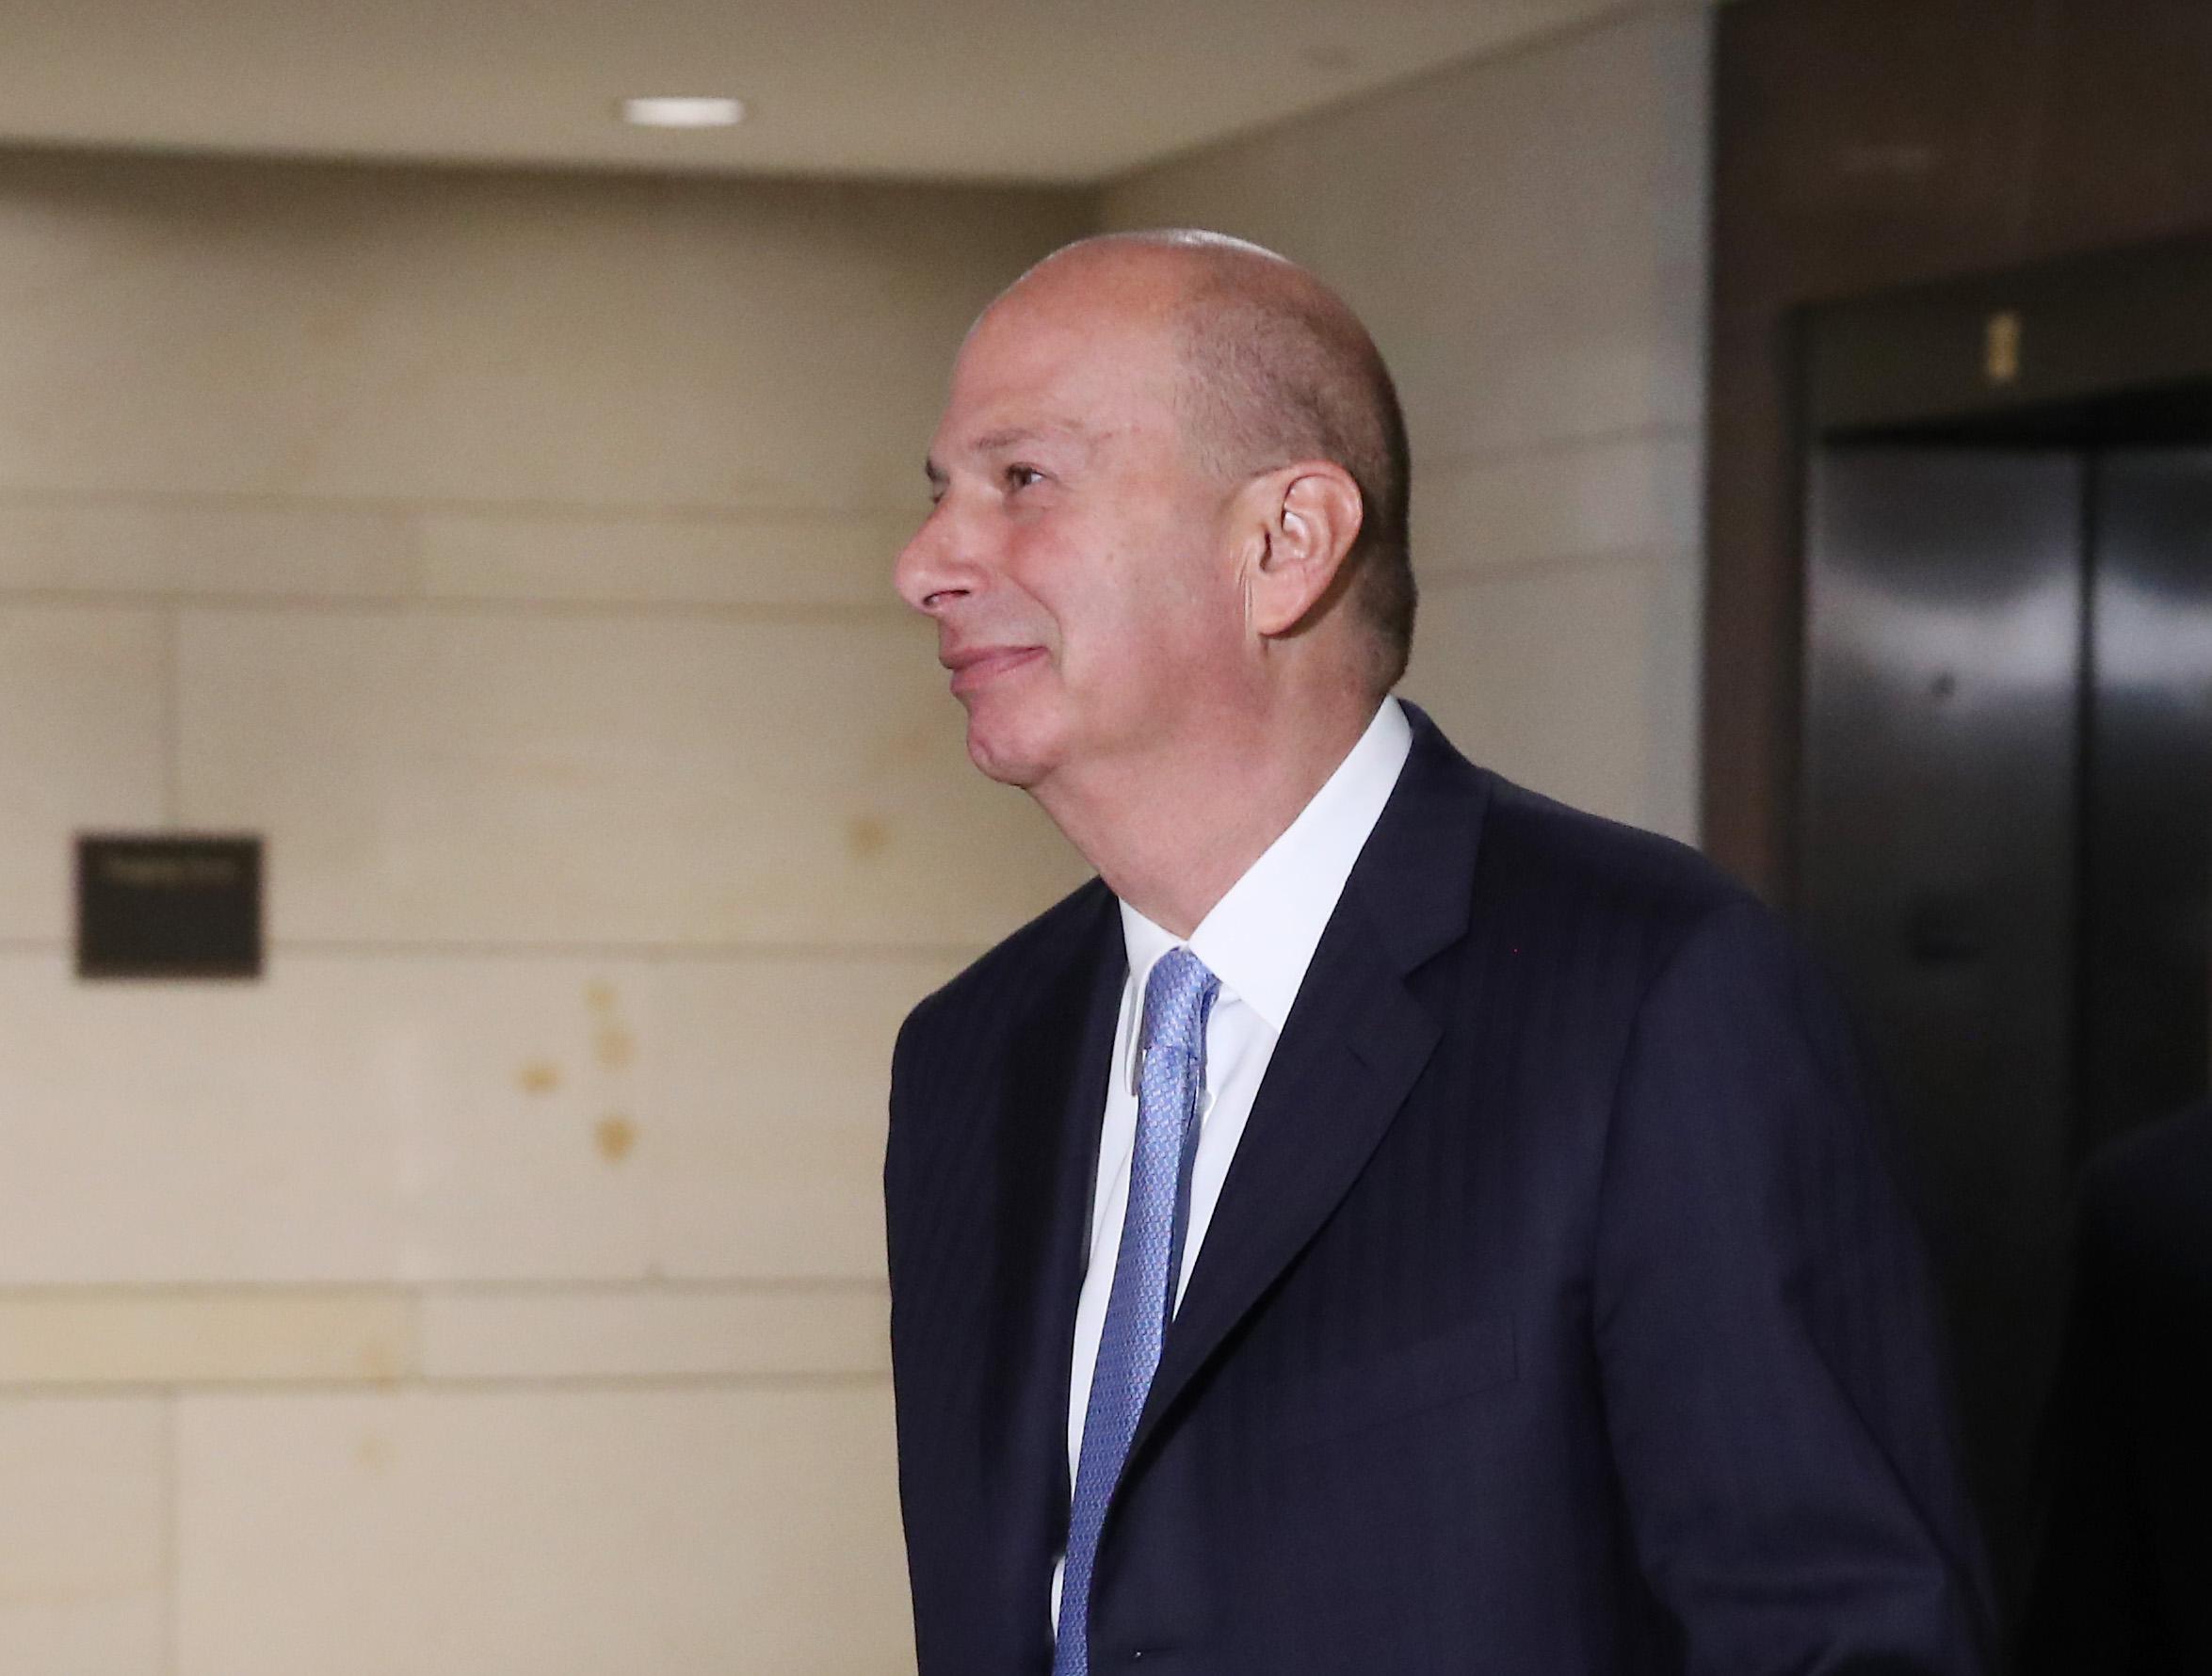 US Ambassador to the European Union Gordon Sondland at the US Capitol on October 28, 2019.